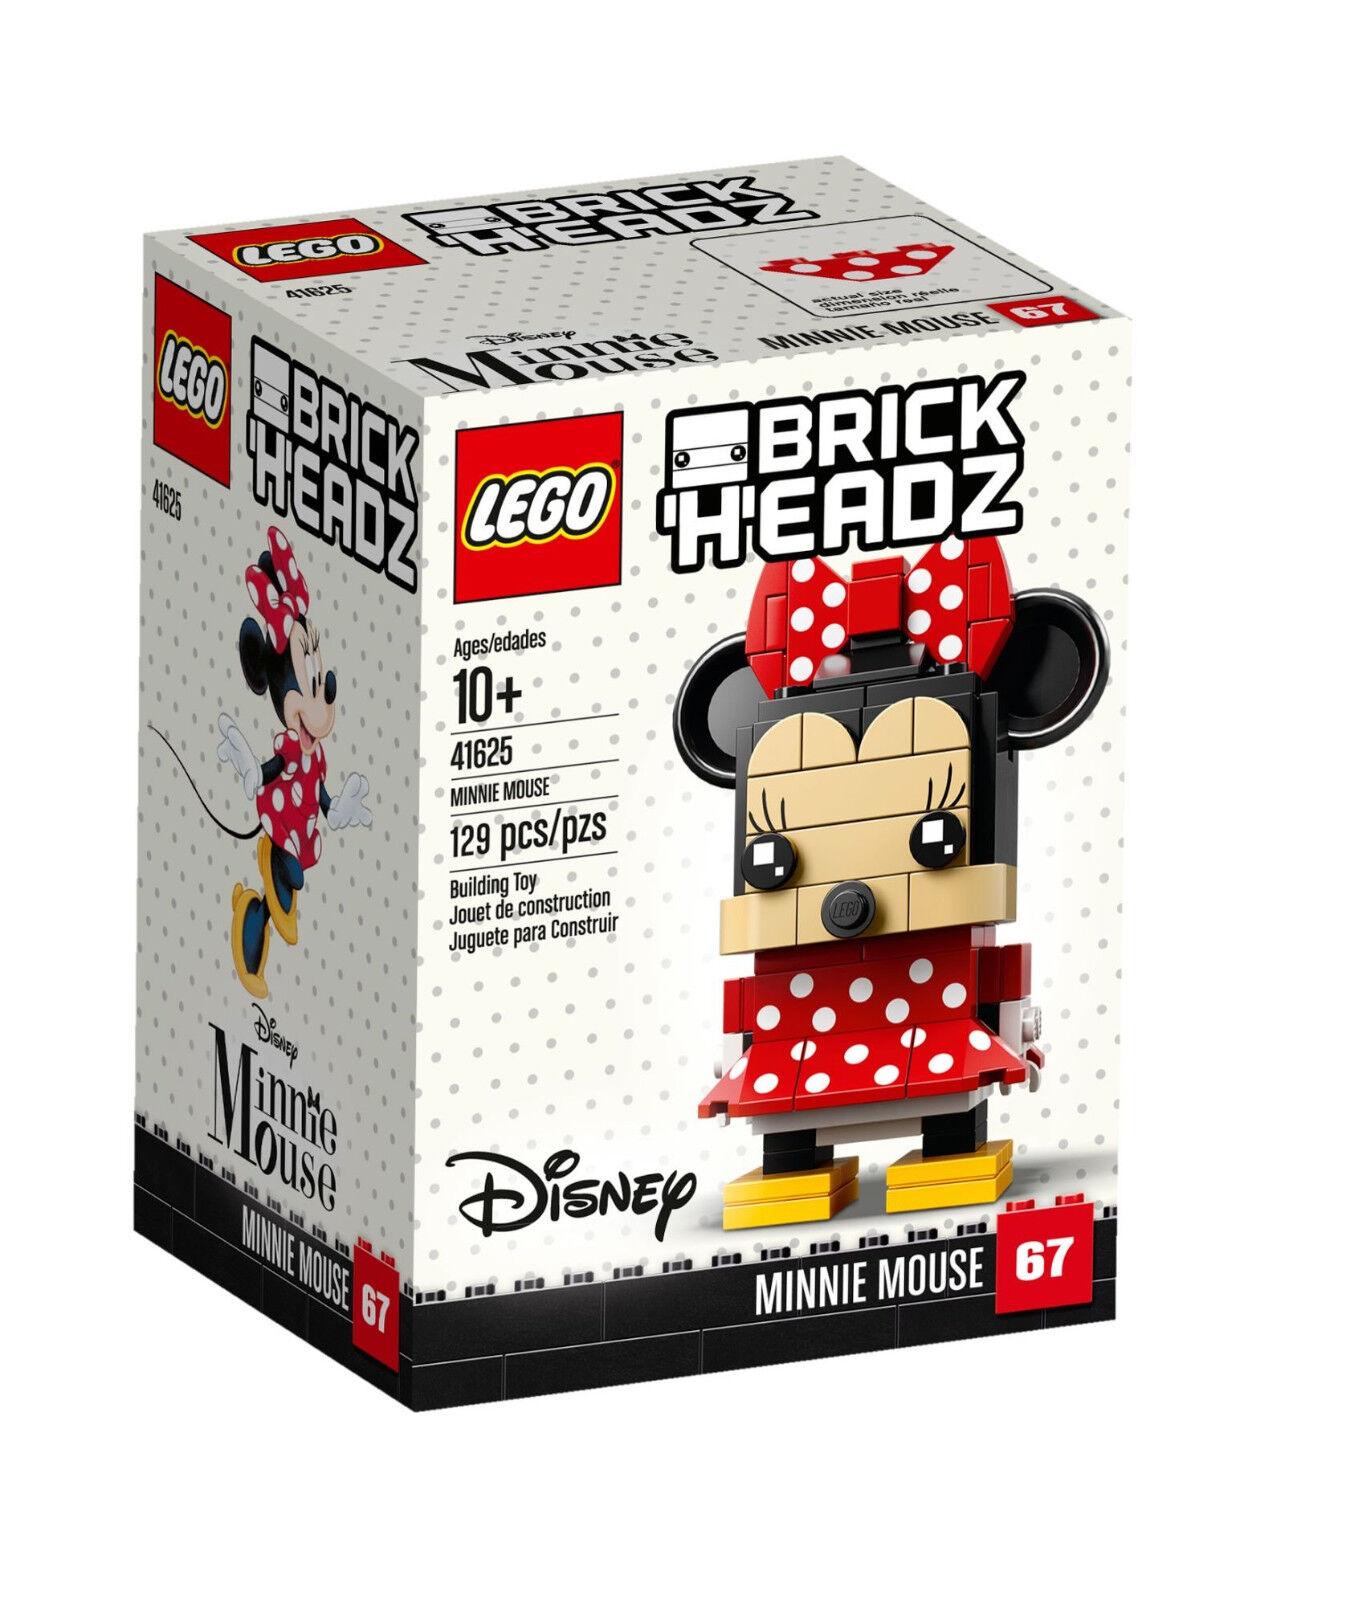 LEGO® BrickHeadz™ (41625) Minnie Mouse Mouse Mouse inkl Versand NEU&OVP e7ad09